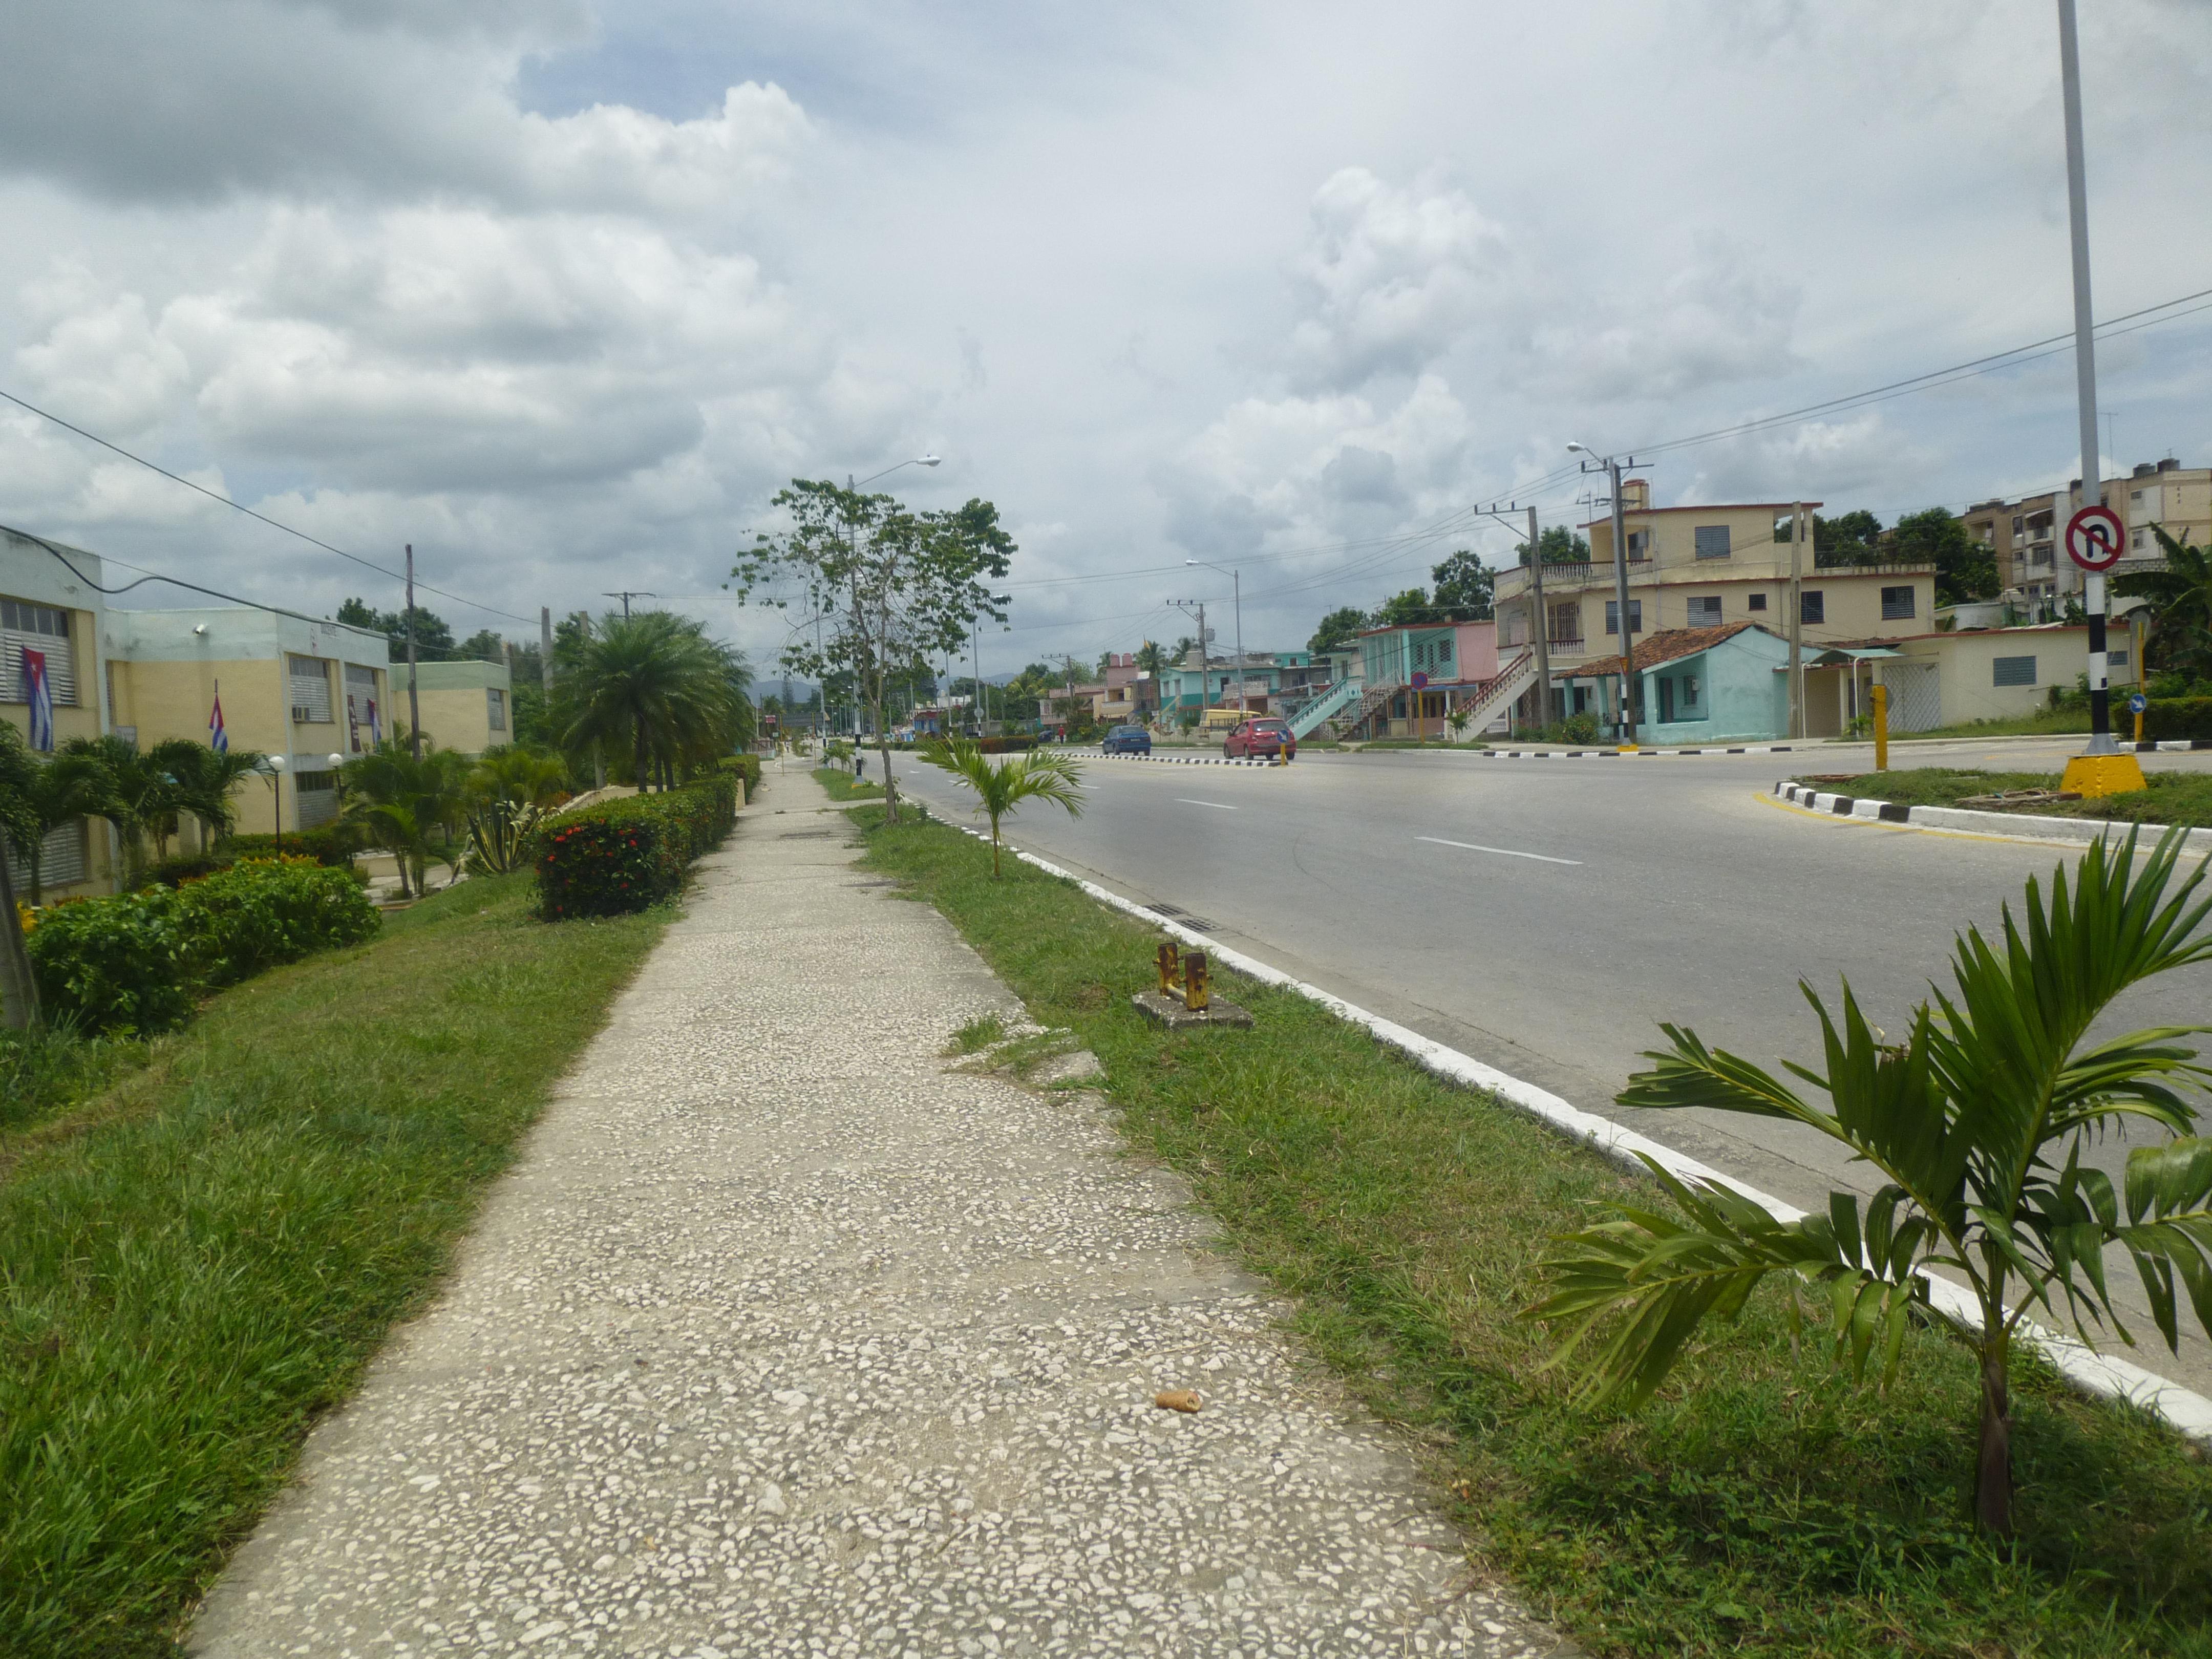 P1040871 - Trouble Outside of Trinidad, Cuba